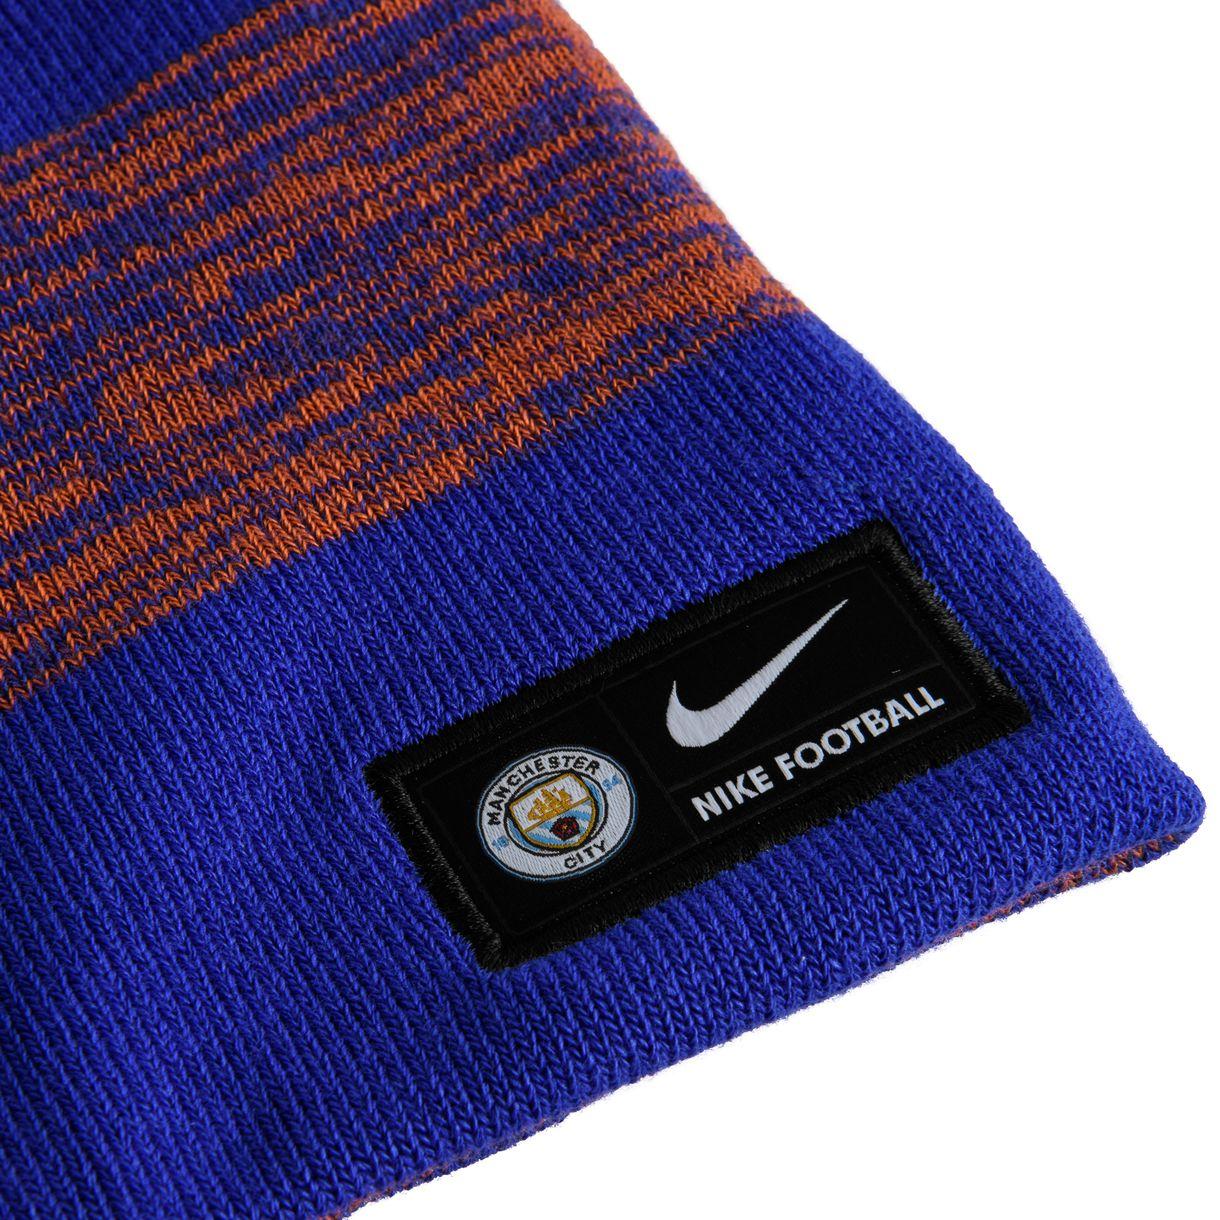 Man City 2016-2017 Training Beanie (Orange)  805460-815  -  13.11 Teamzo.com 592101d18c9